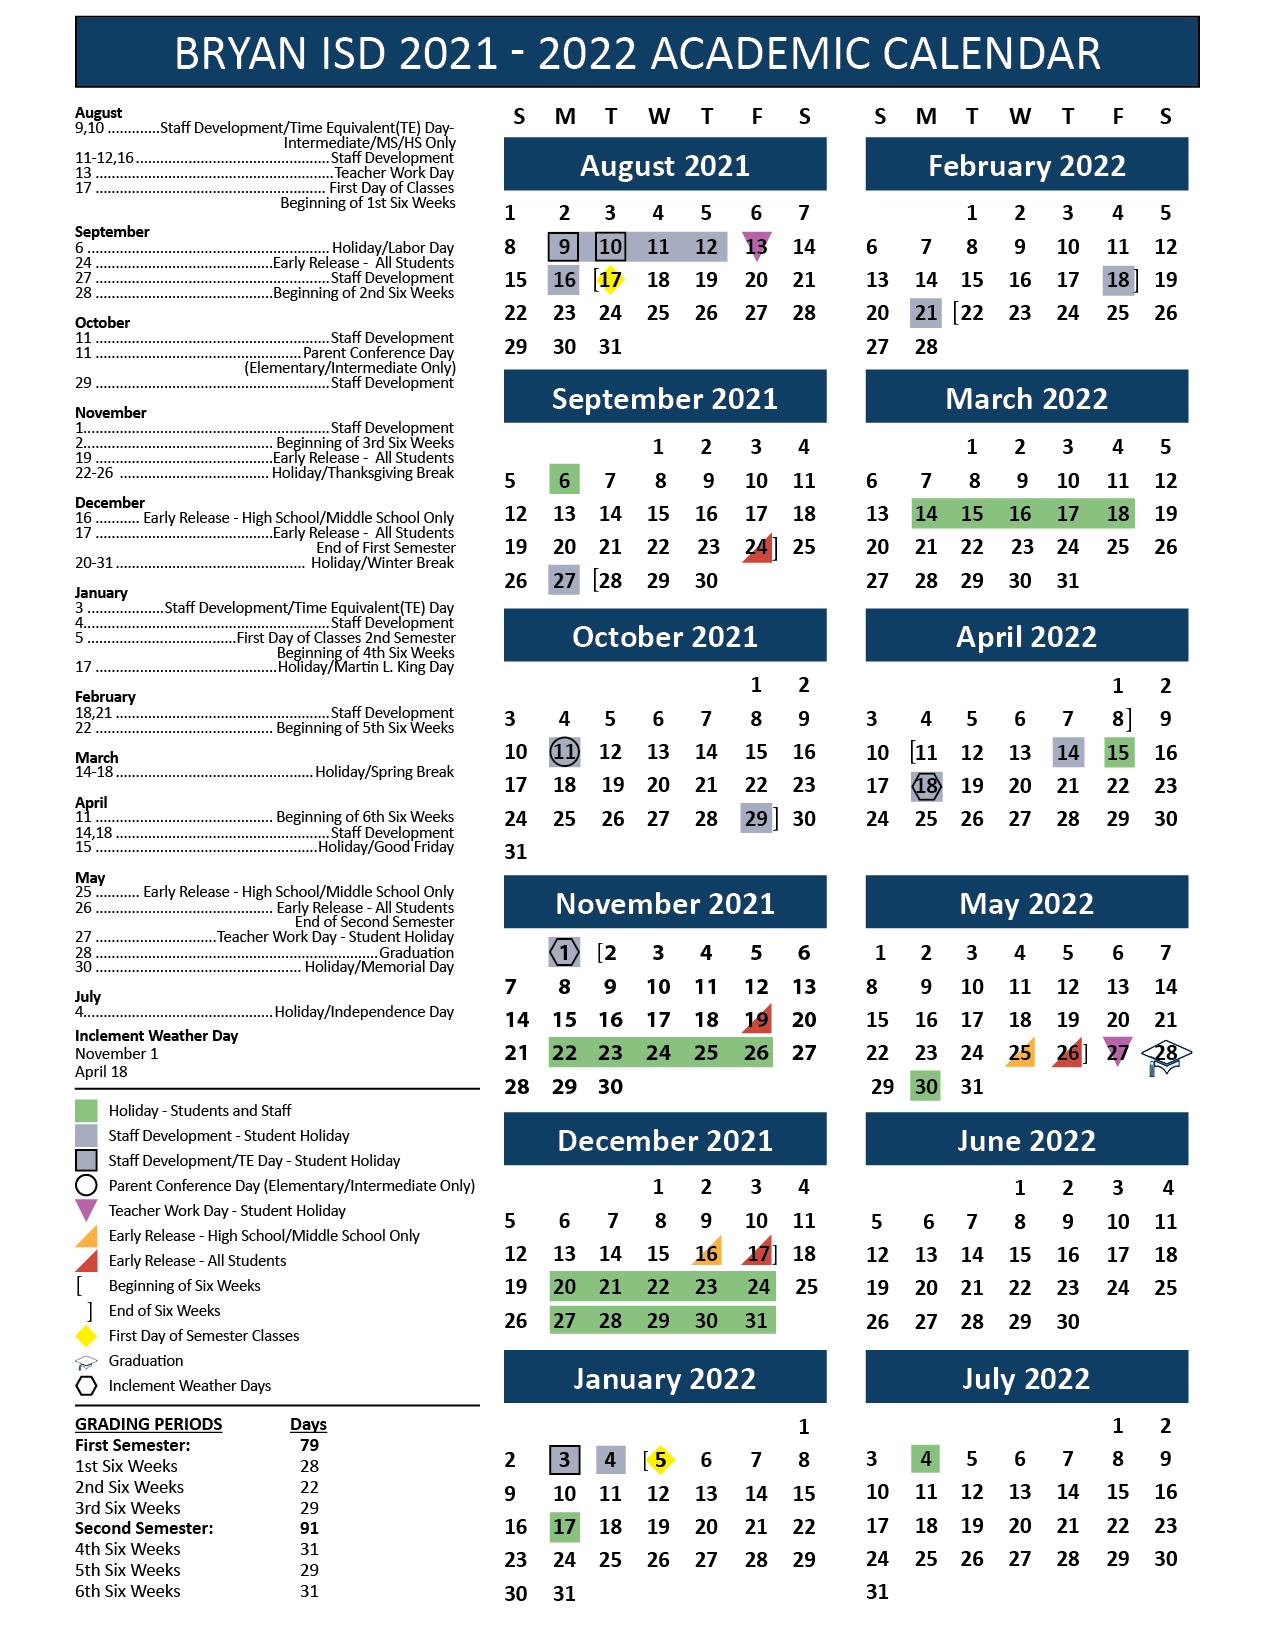 Tamu Academic Calendar 2022 2023.Bryan Independent School District